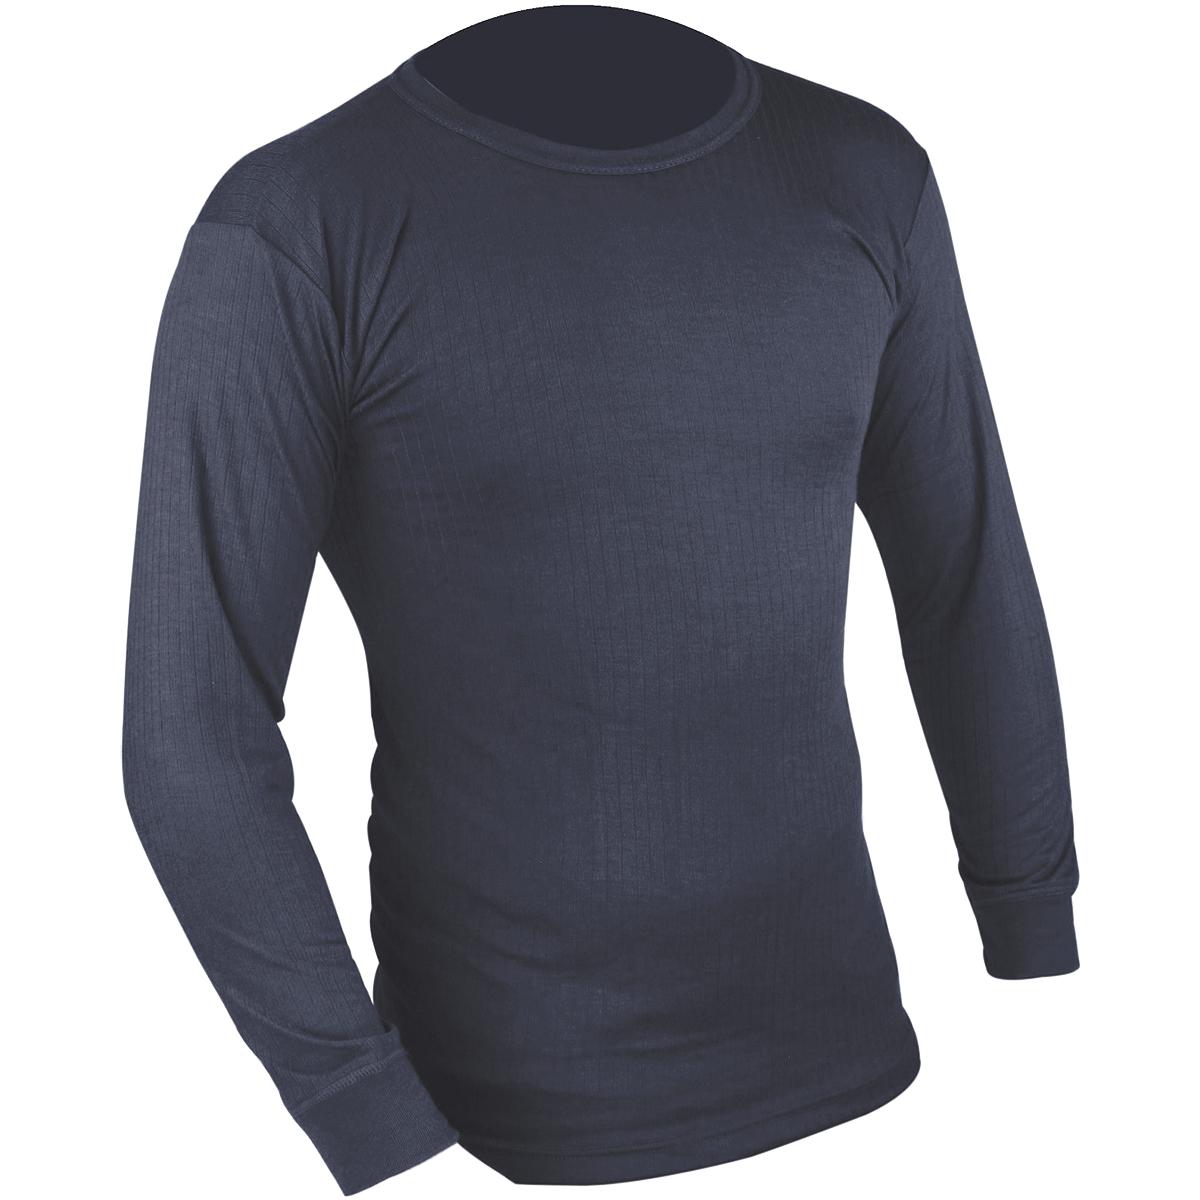 Highlander long sleeve thermal vest mens base layer shirt for Mens black thermal t shirts